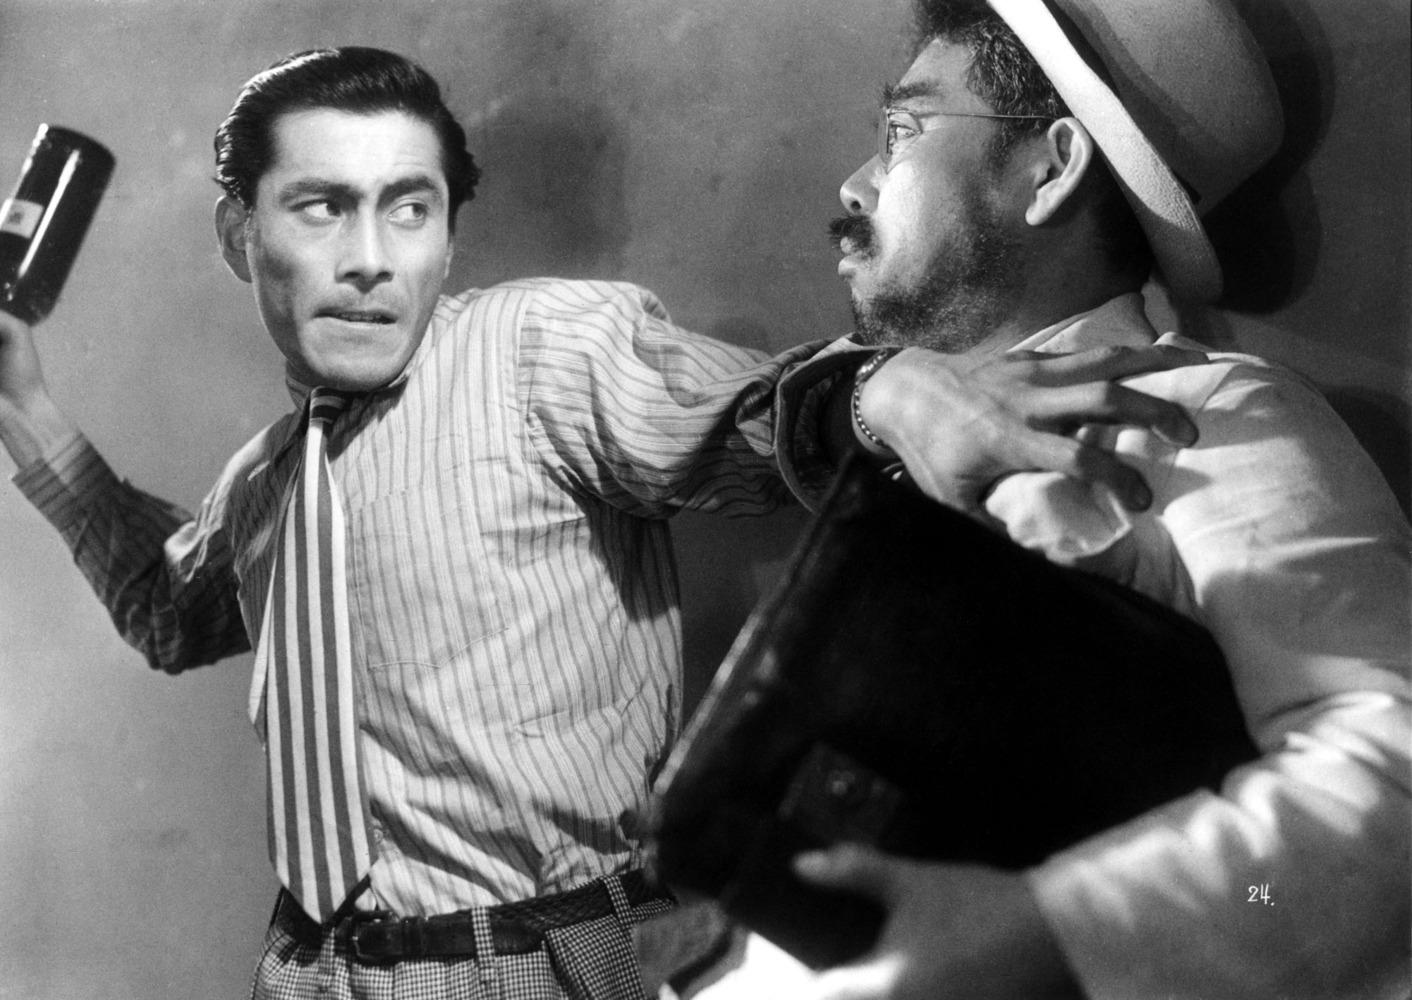 Toshiro Mifune dans L'Ange ivre de Akira Kurosawa